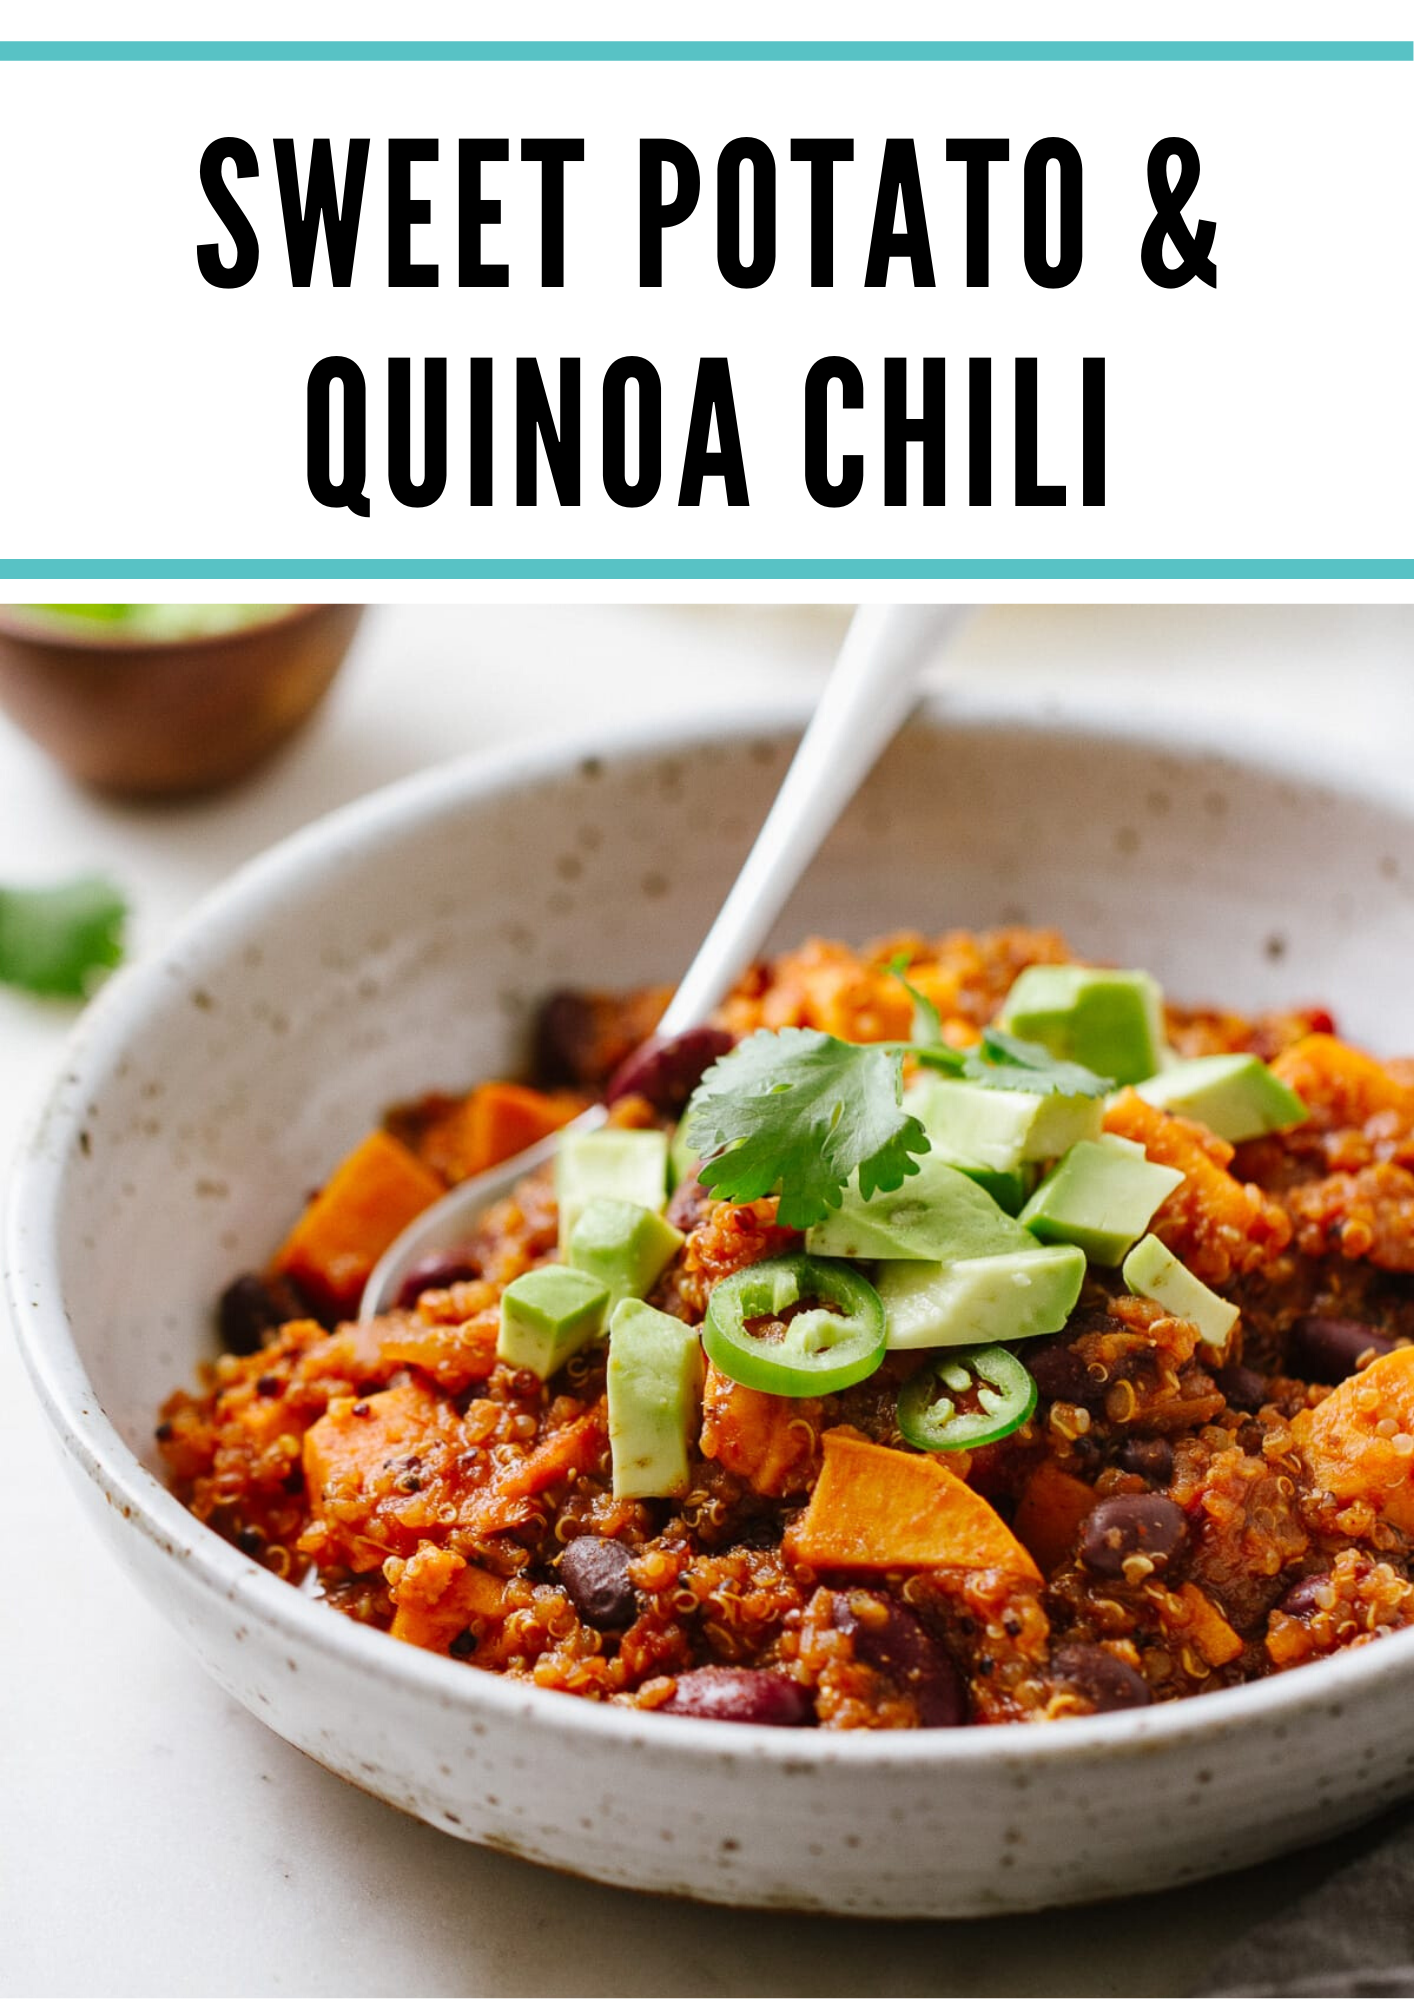 Sweet Potato Quinoa Chili Vegan Bowl Recipes Vegan Recipes Vegan Recipes Healthy